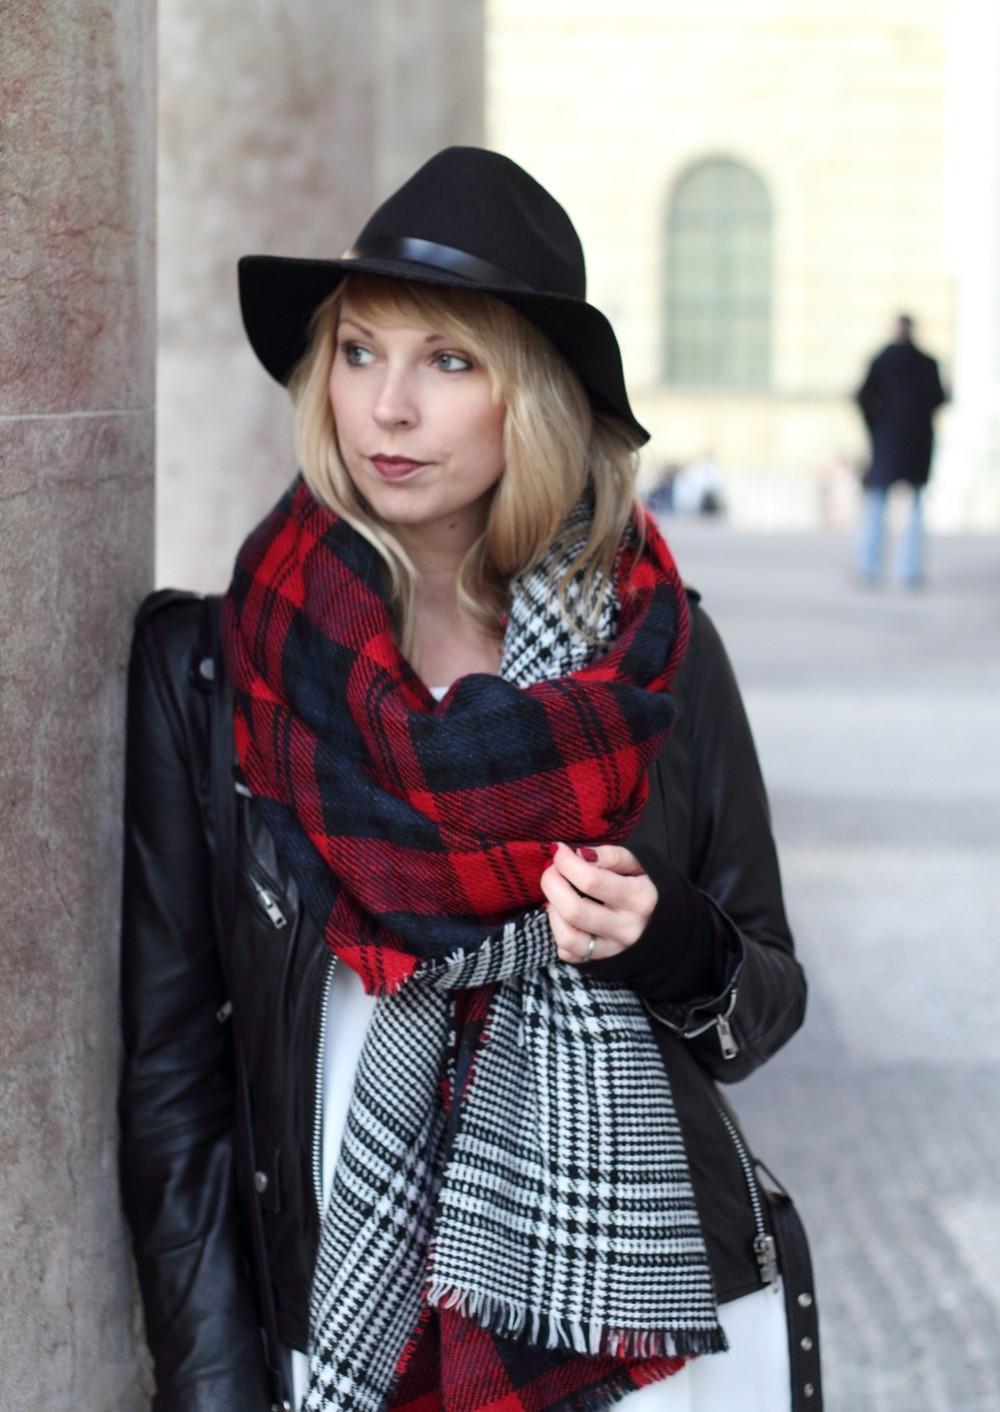 Fashionbloggerin Karlsruhe Outfit München weisses Kleid karierter Schal Lederjacke Hut Fransentasche 25